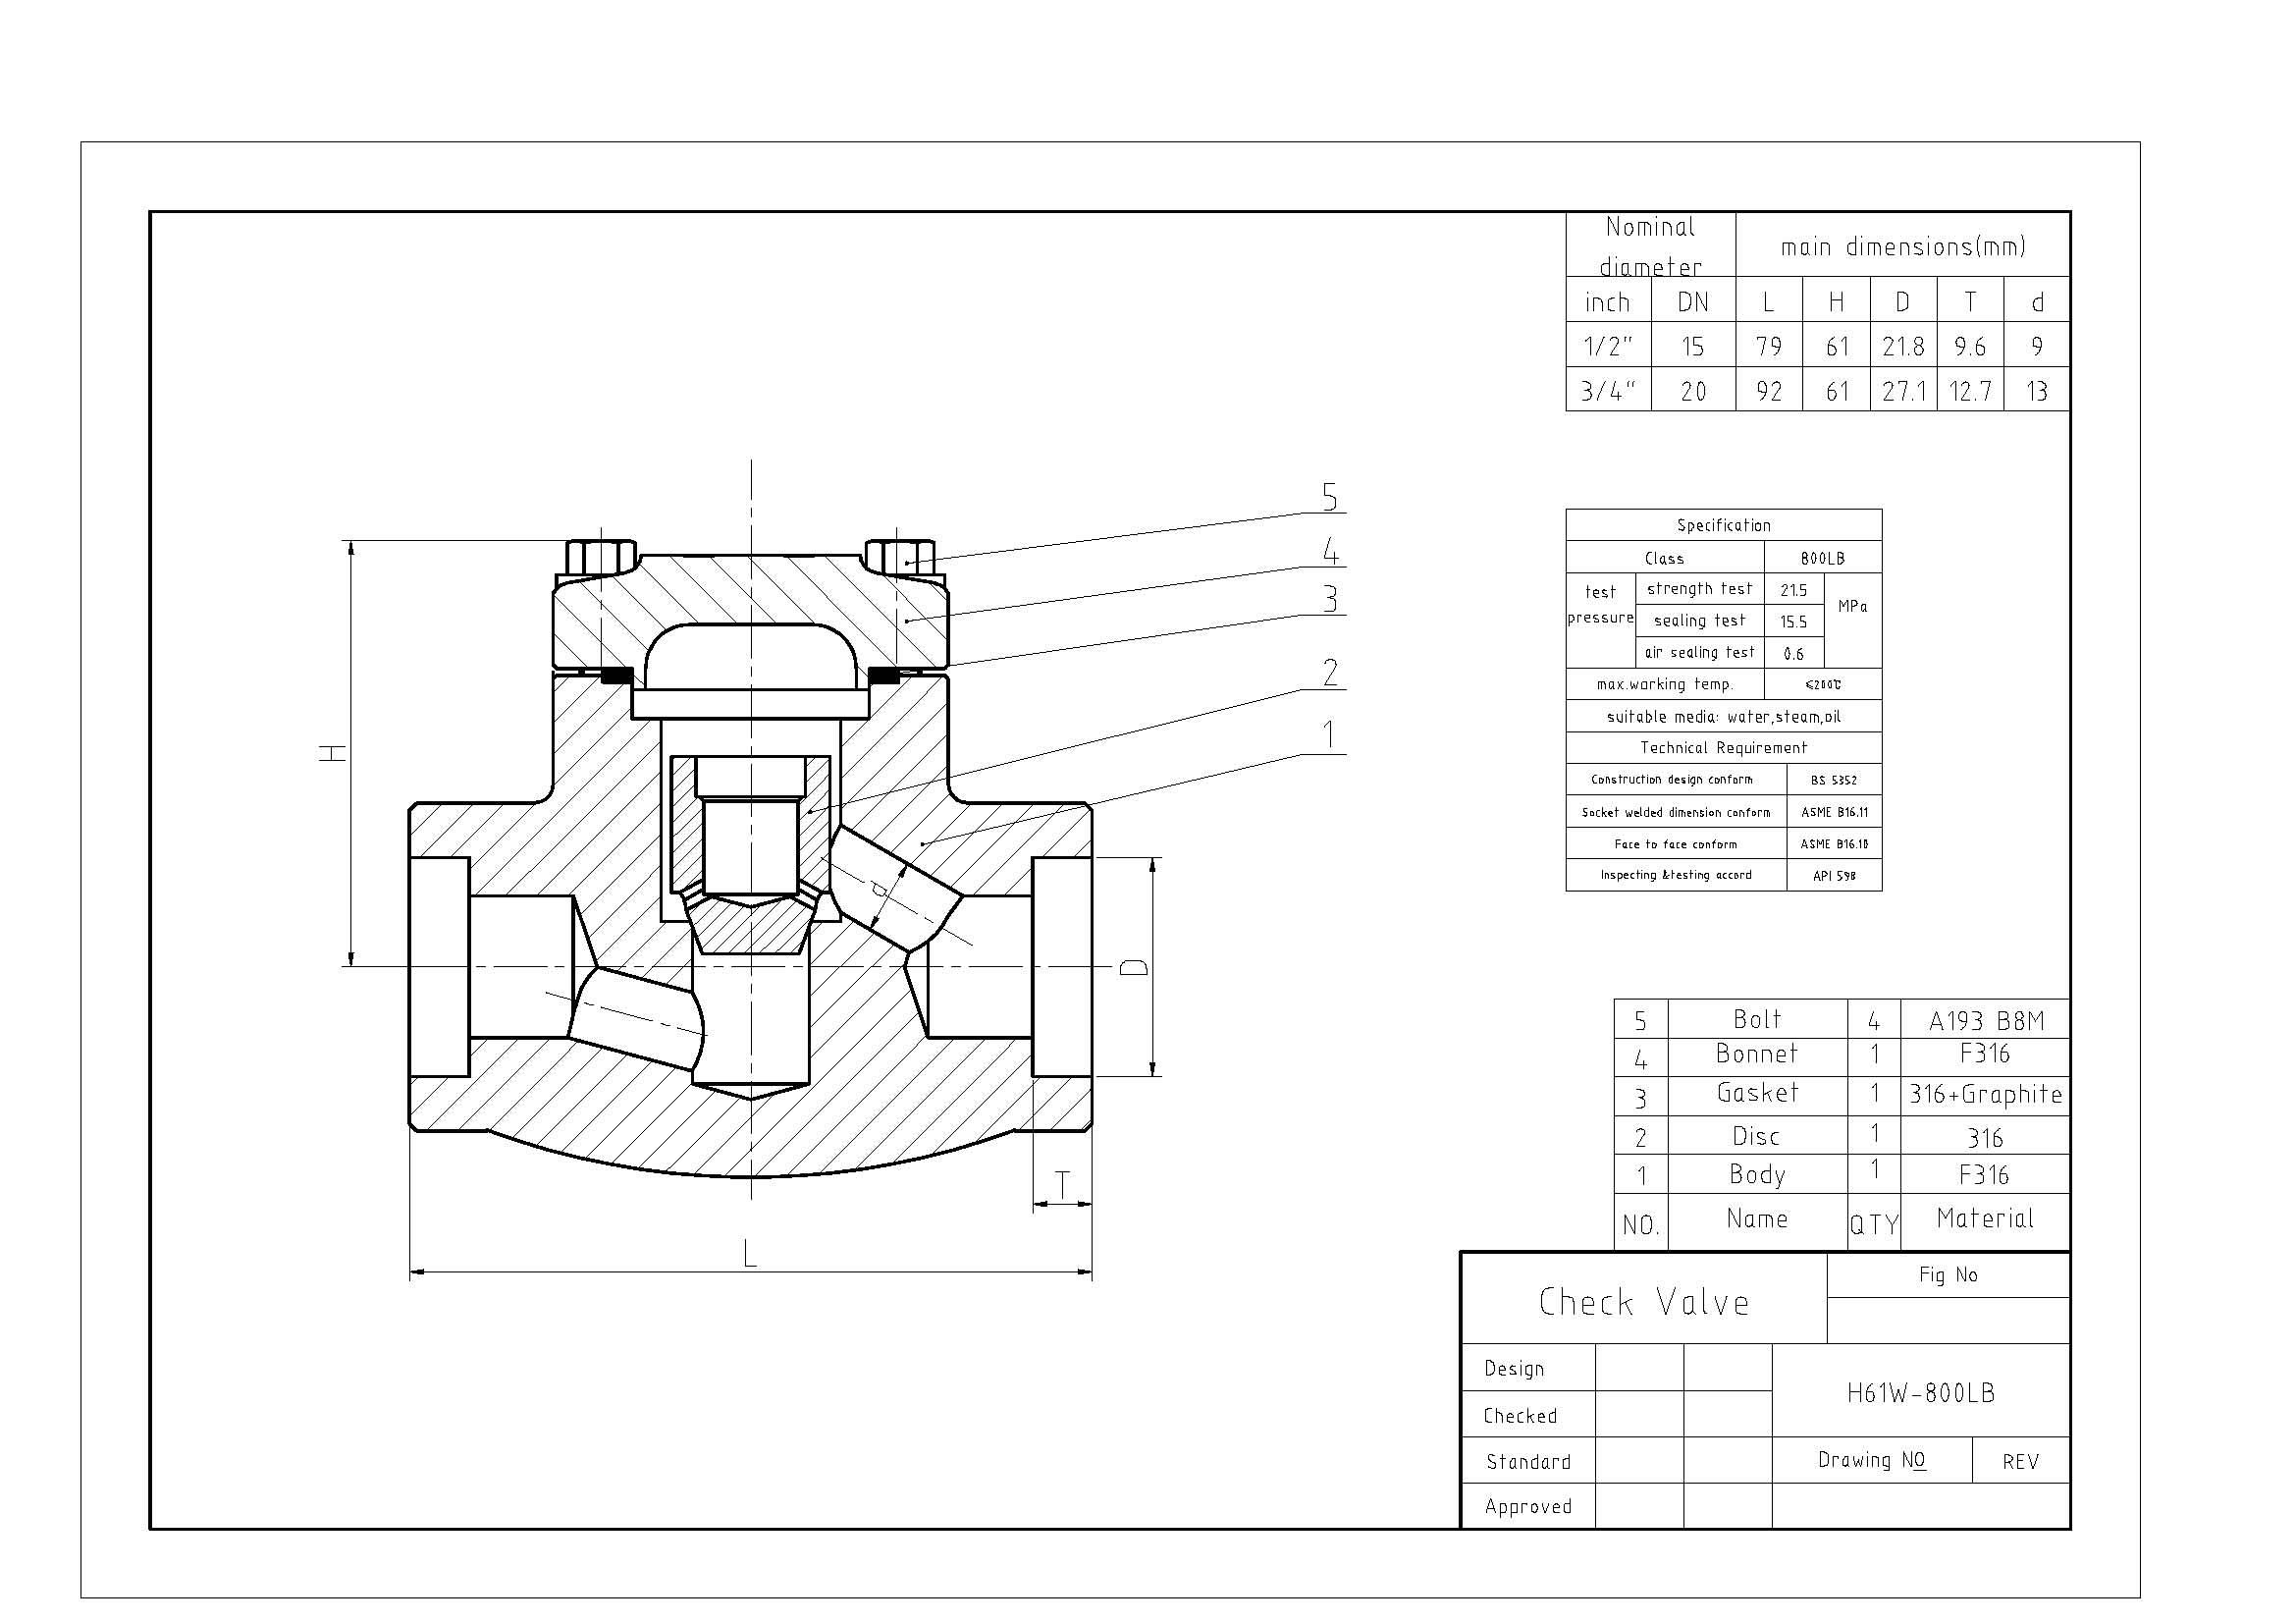 Lift Check Valves Api 602 Cl800 Dn32 Fnpt End Industrial